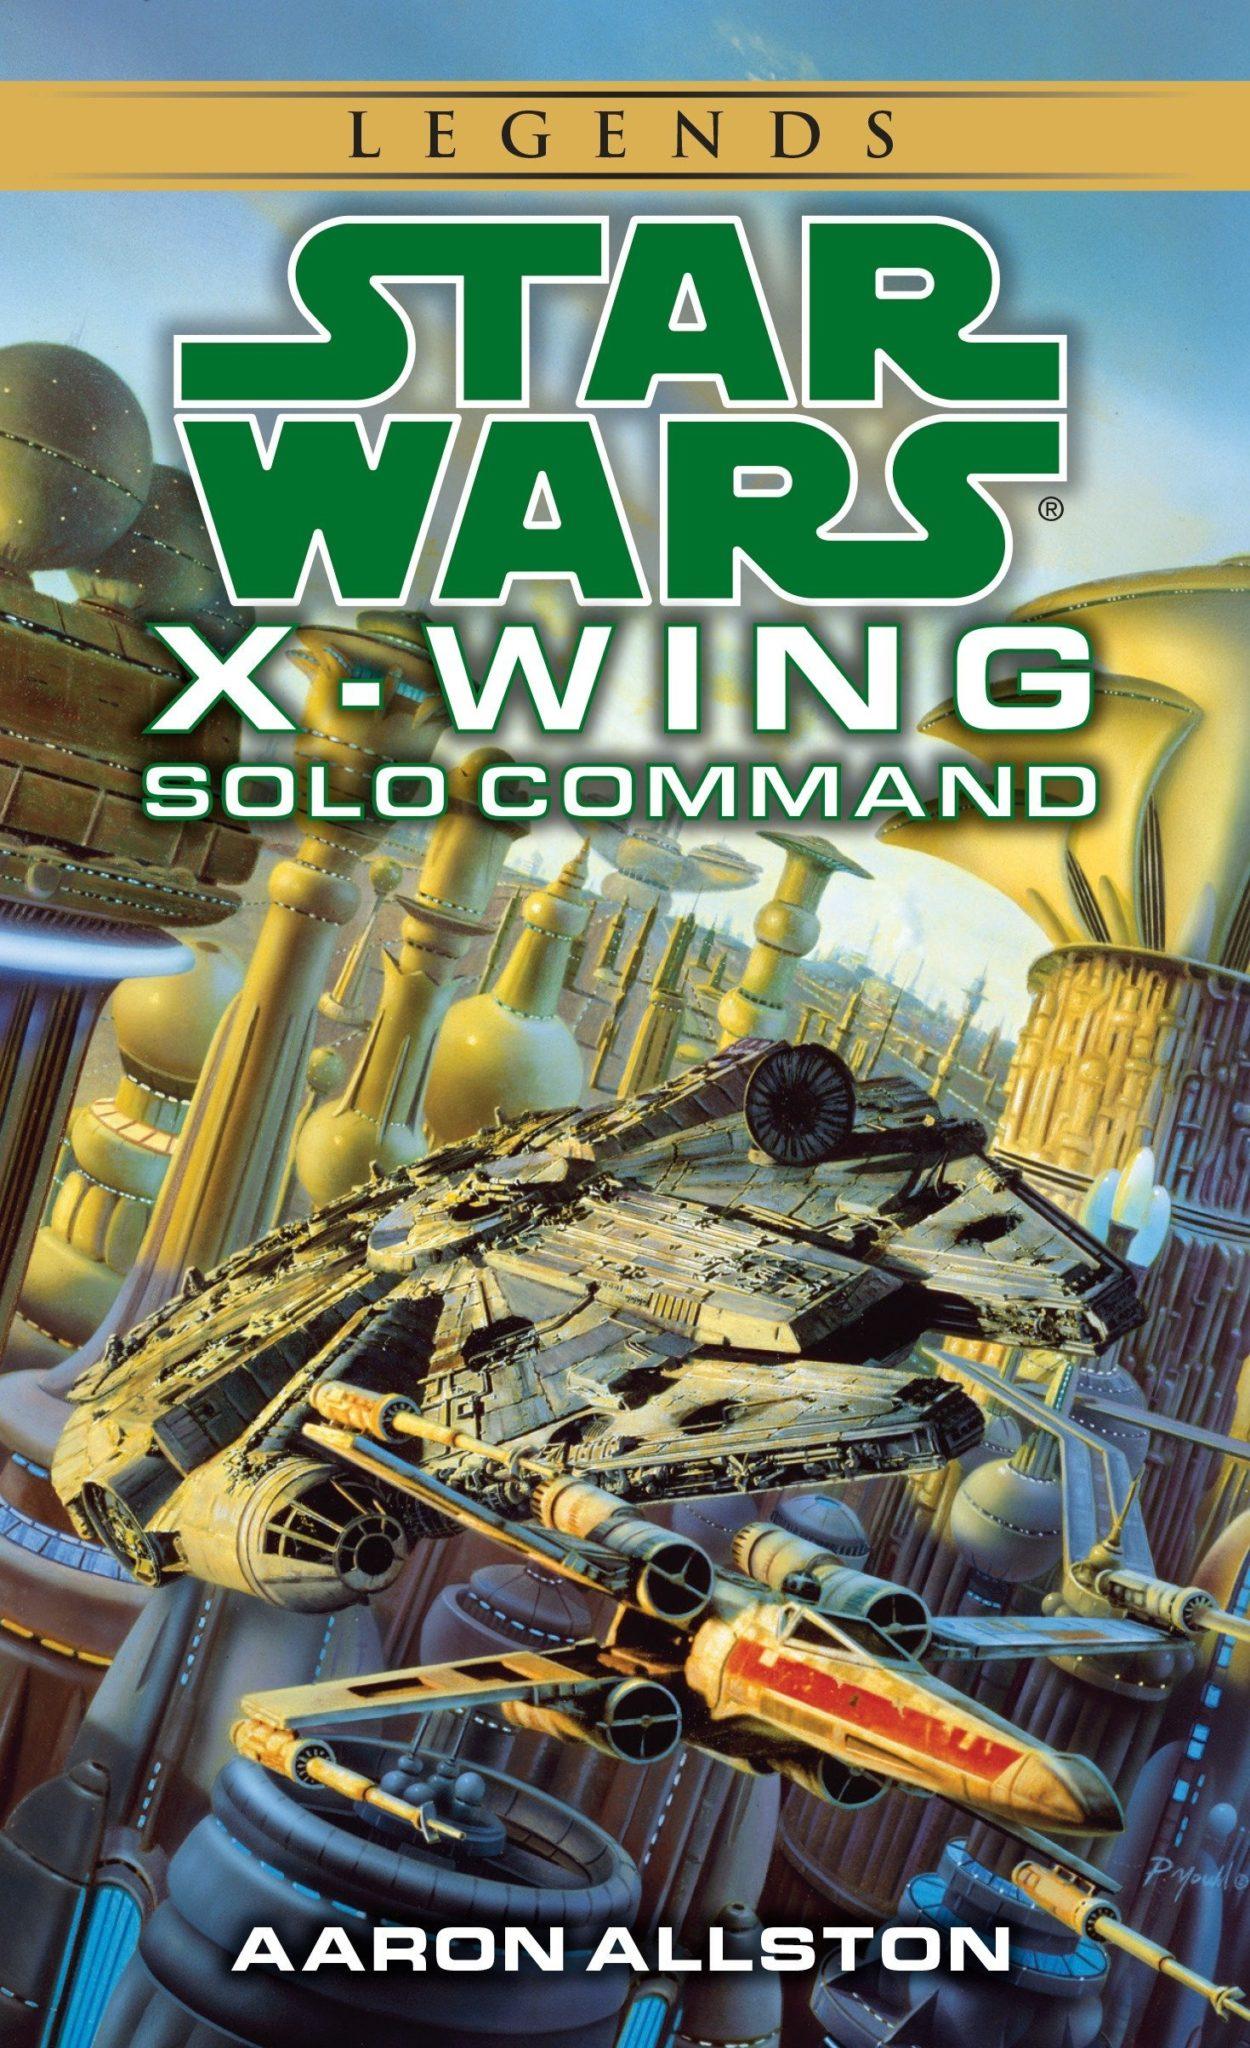 Star Wars books 17